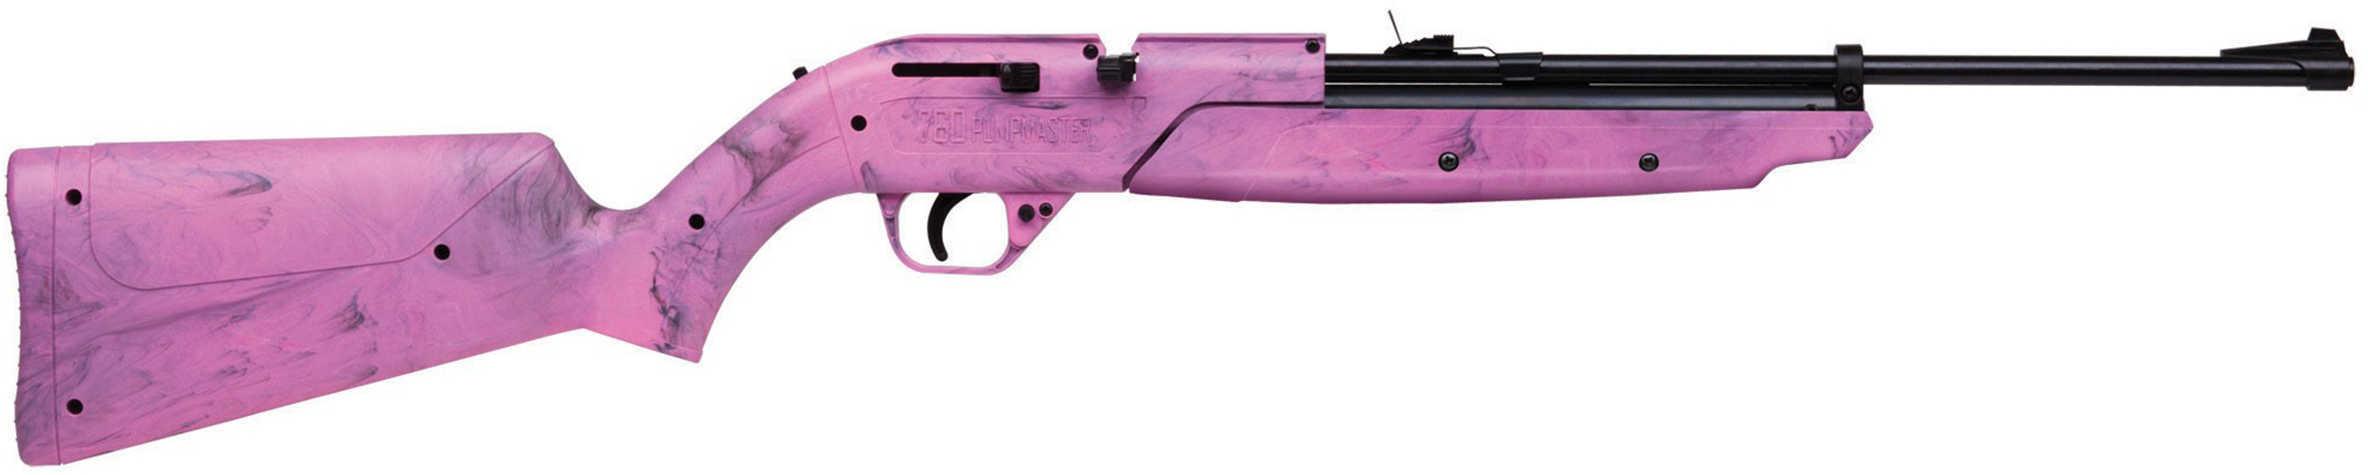 Crosman Pumpmaster 760 Pink Rifle .177 Caliber BB/Pellets